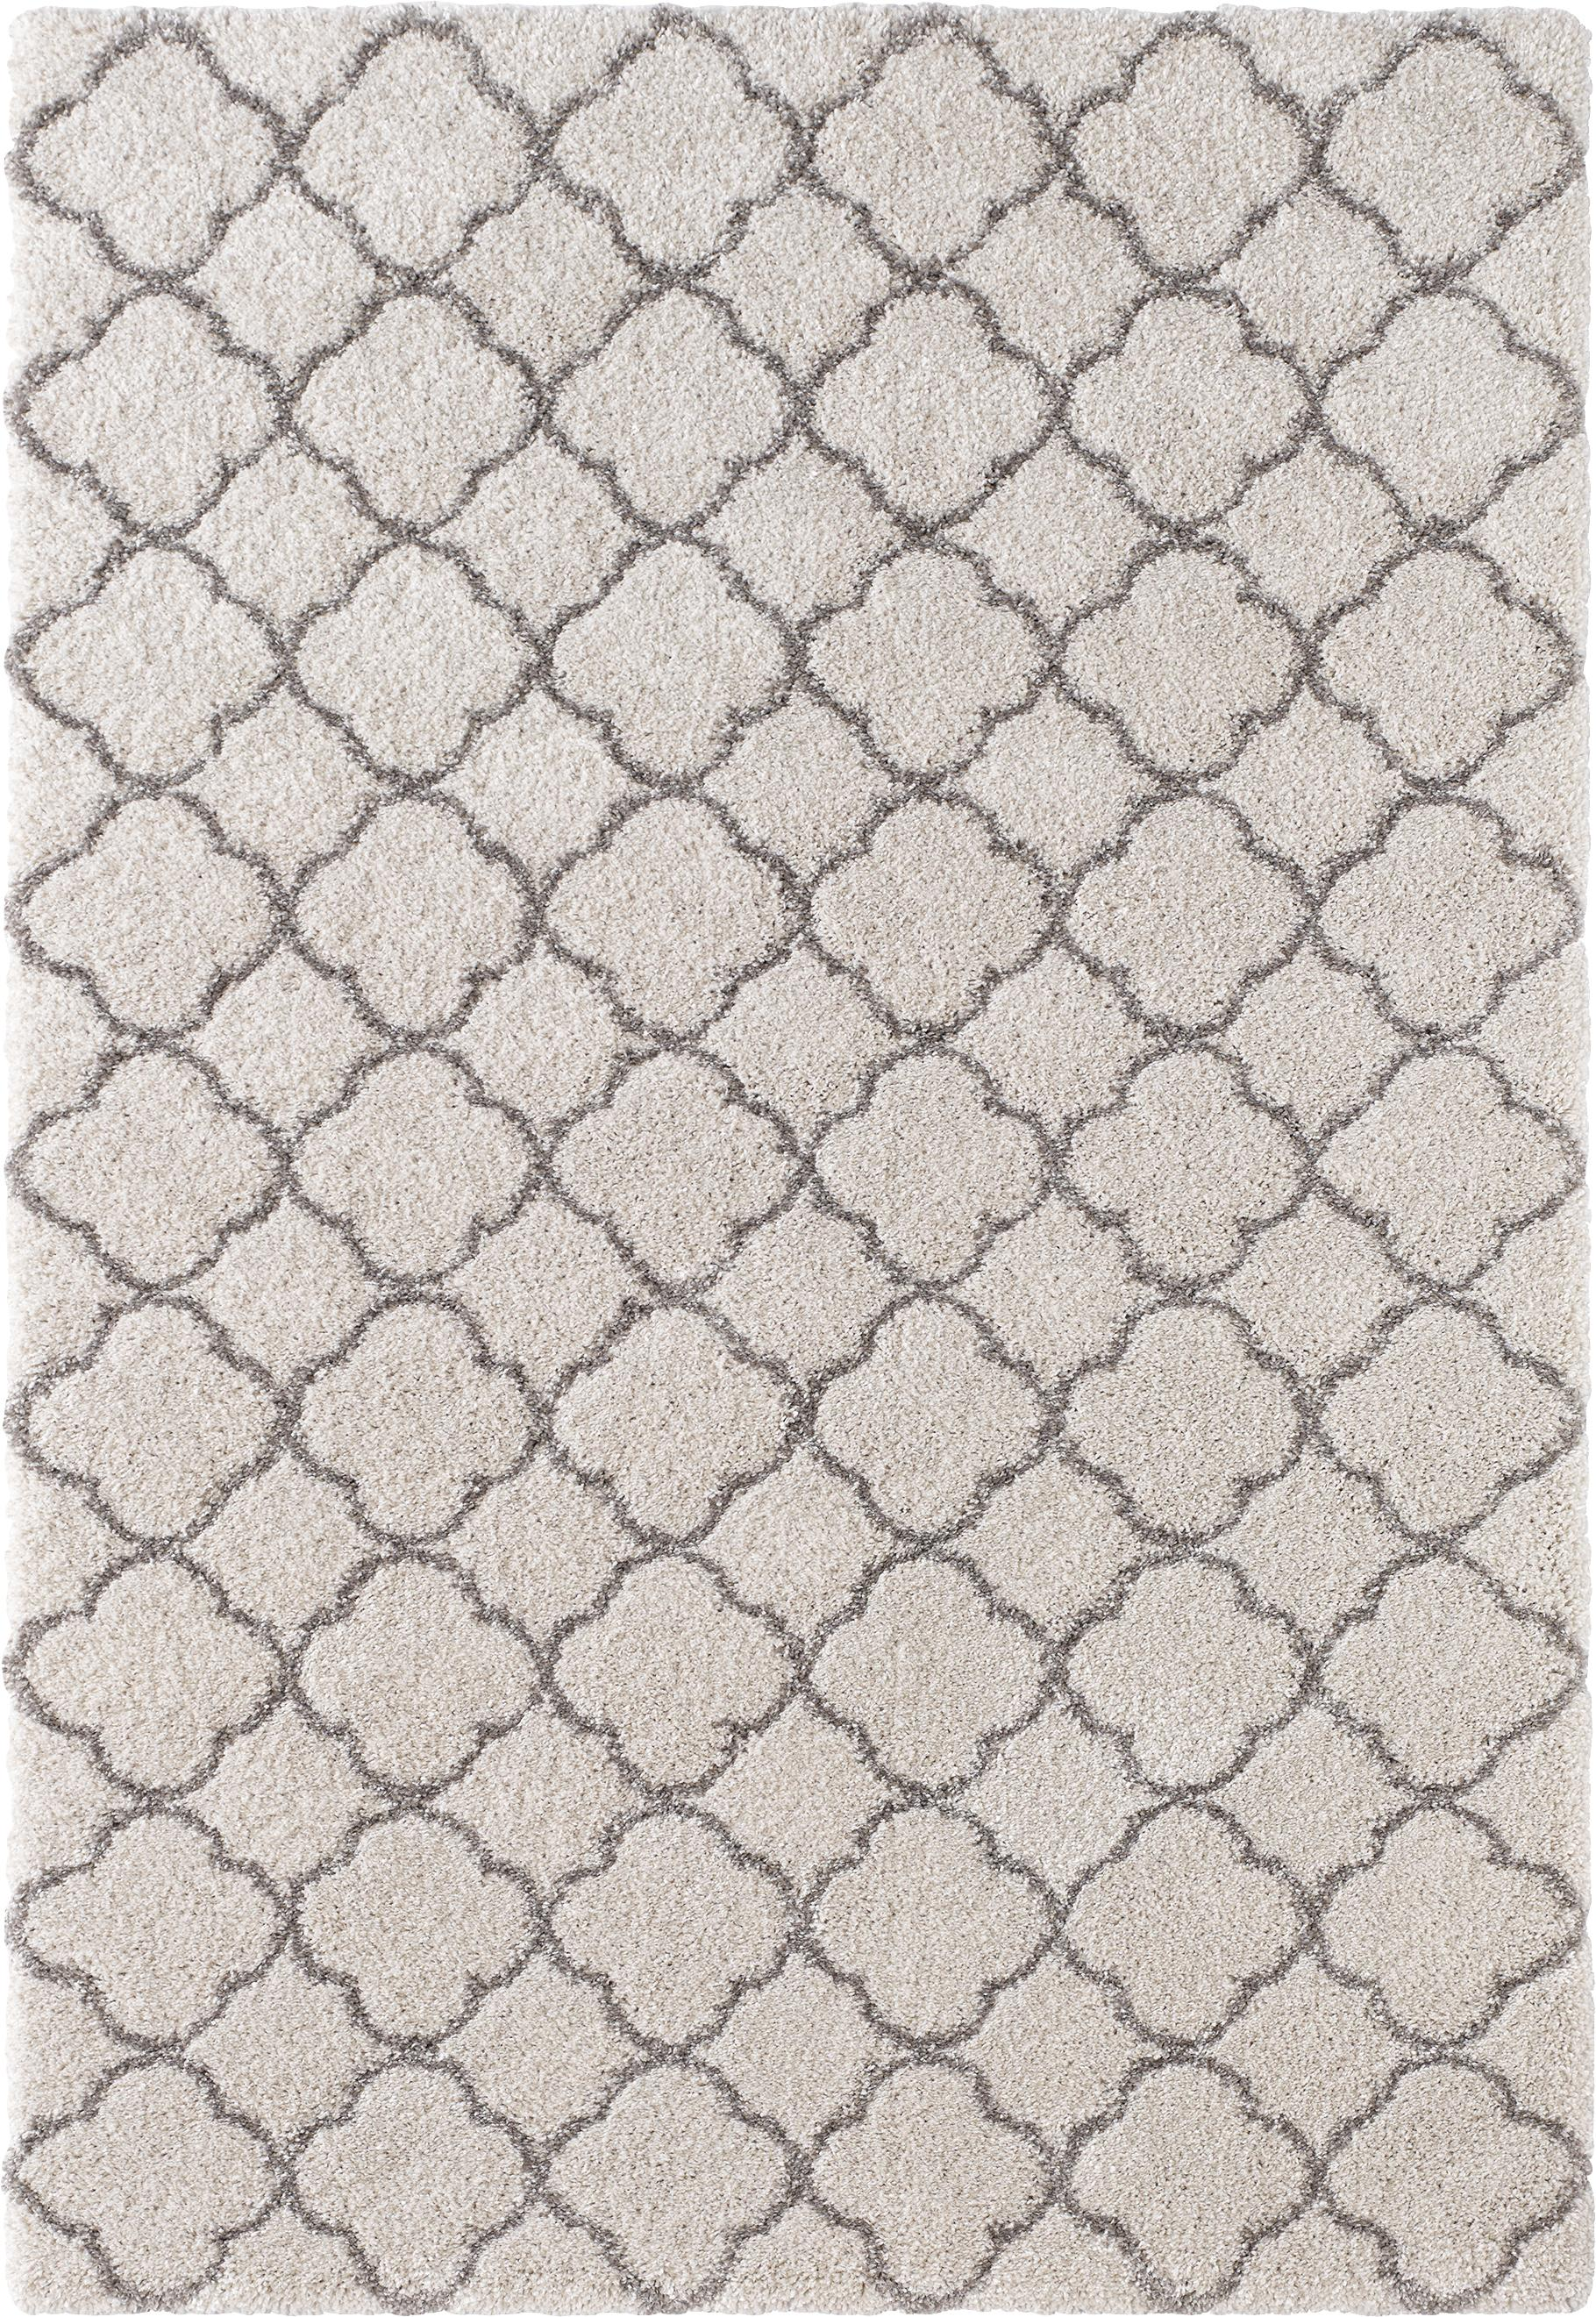 Hochflor-Teppich Luna in Creme/Grau, Flor: 100% Polypropylen, Creme, Grau, B 80 x L 150 cm (Größe XS)